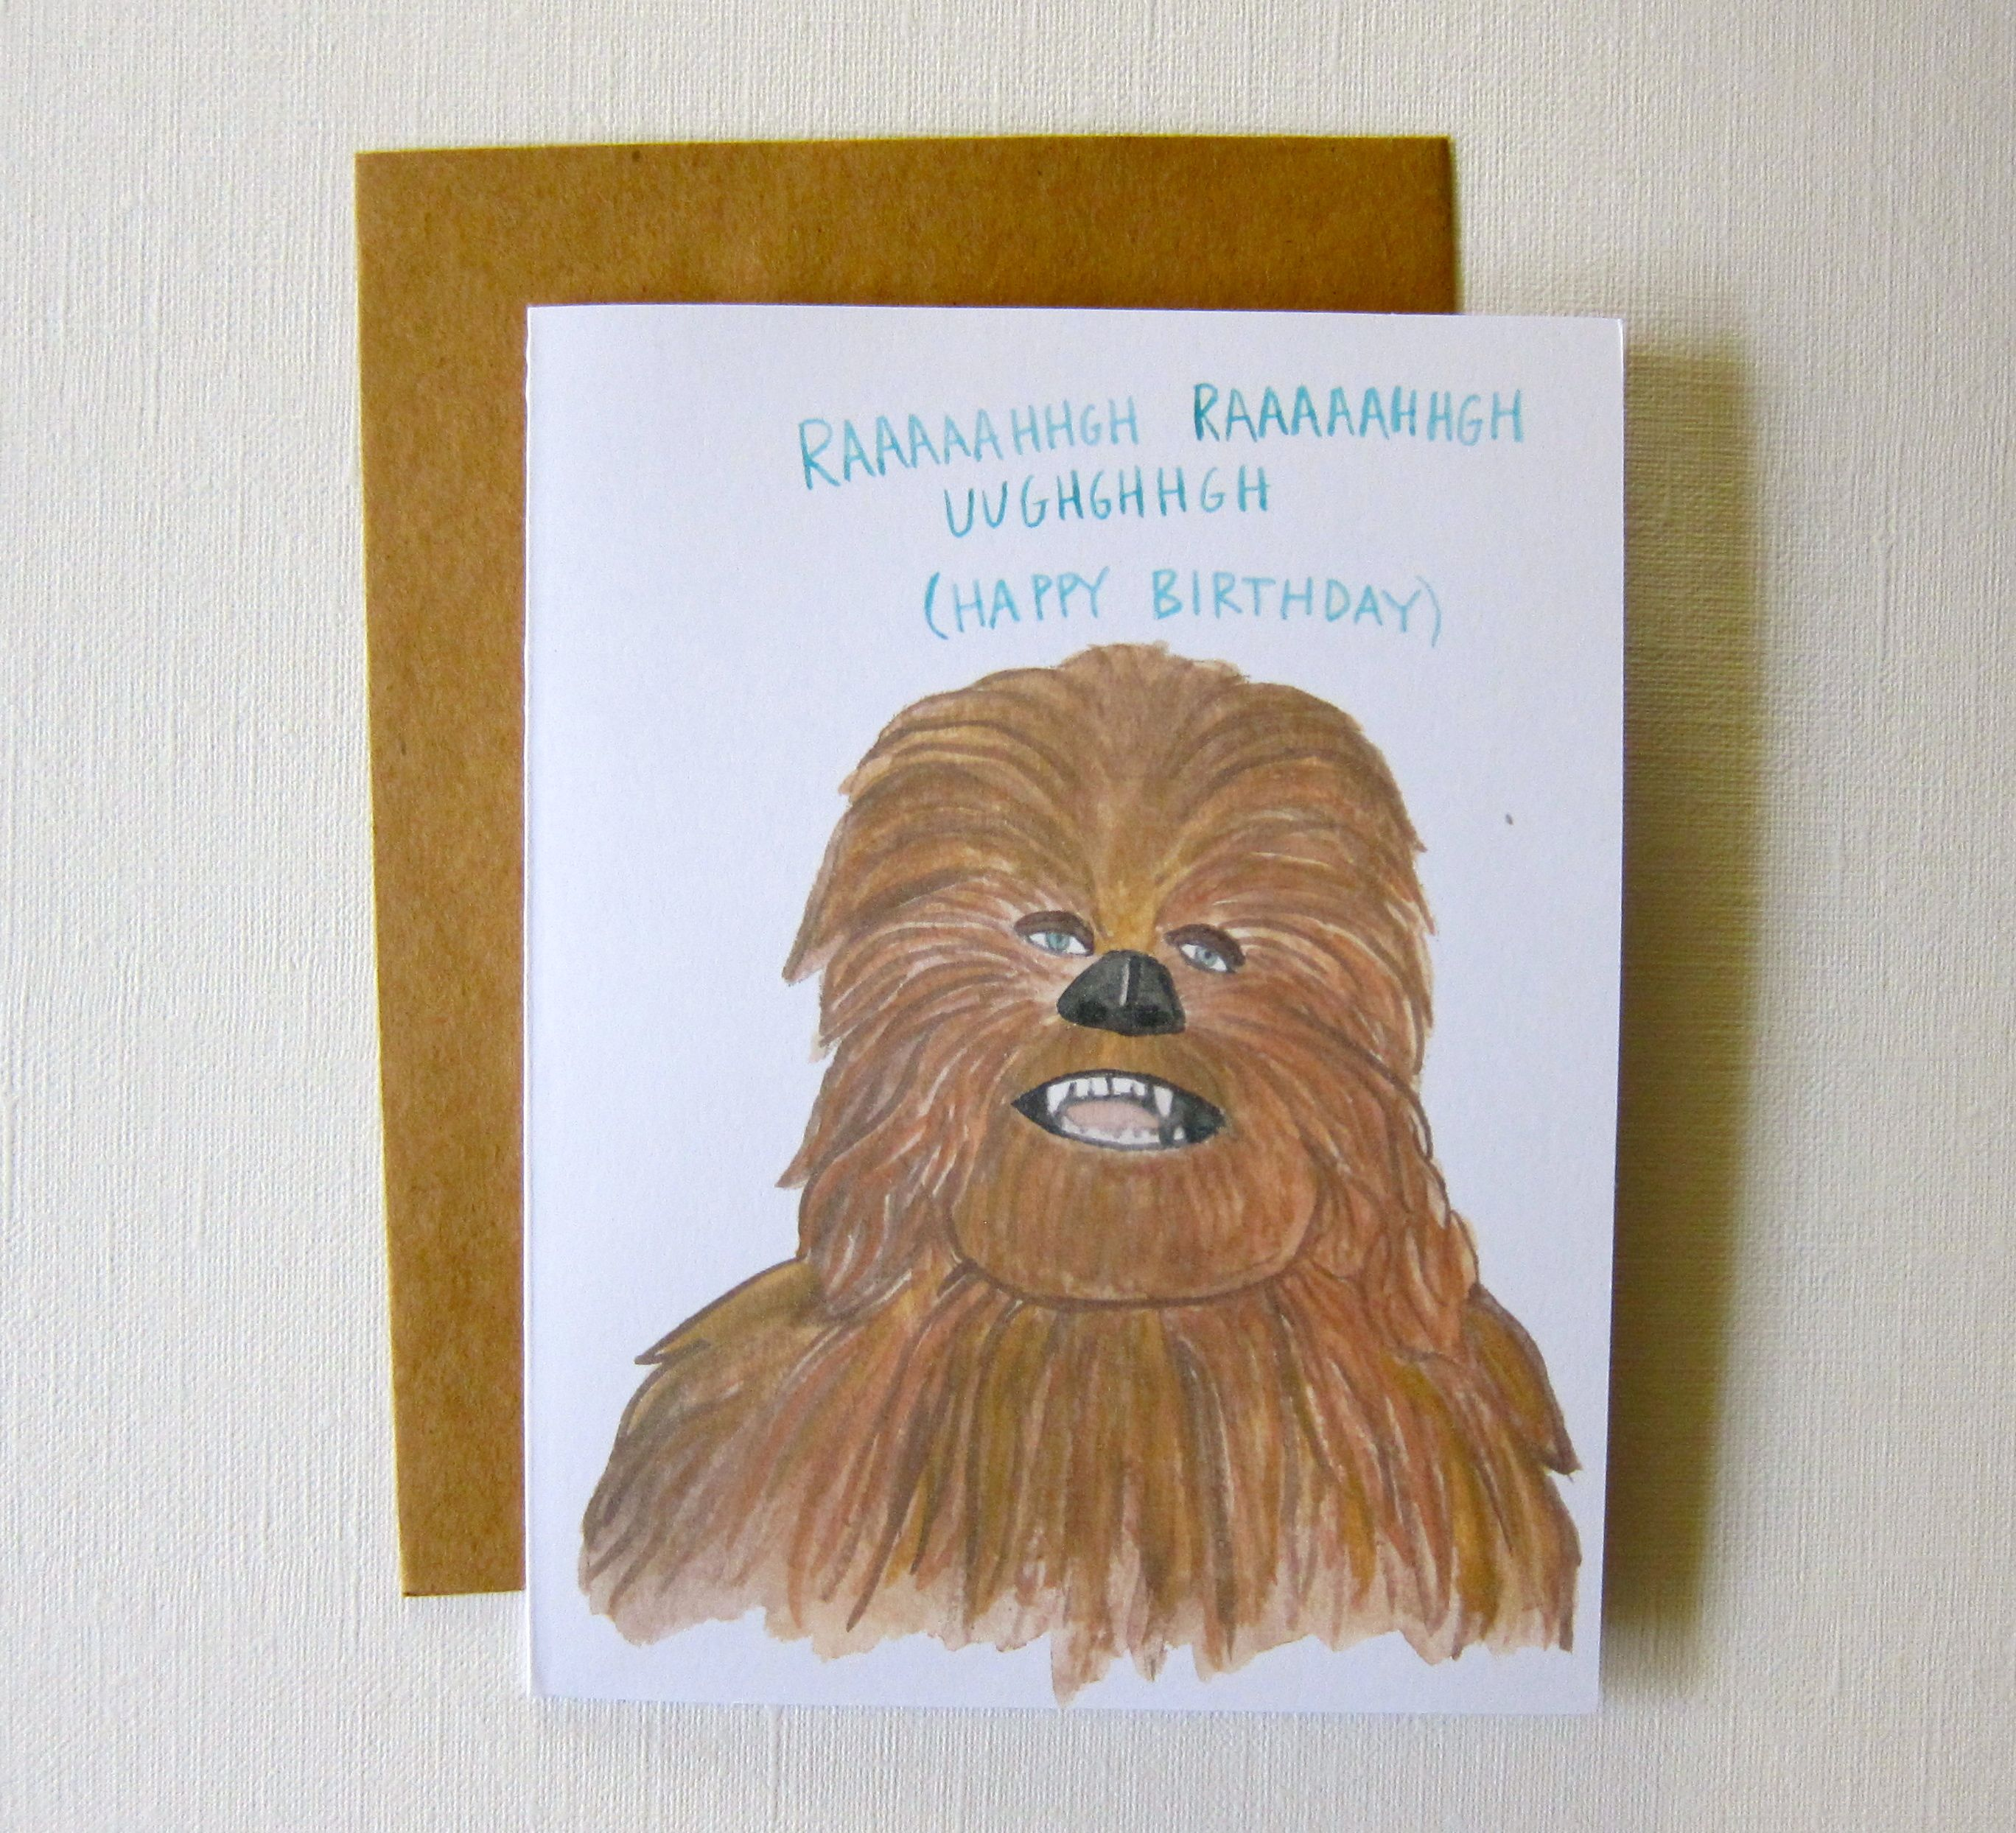 Star wars birthday card chewbacca funny star wars birthday chewbacca star wars birthday card bookmarktalkfo Choice Image